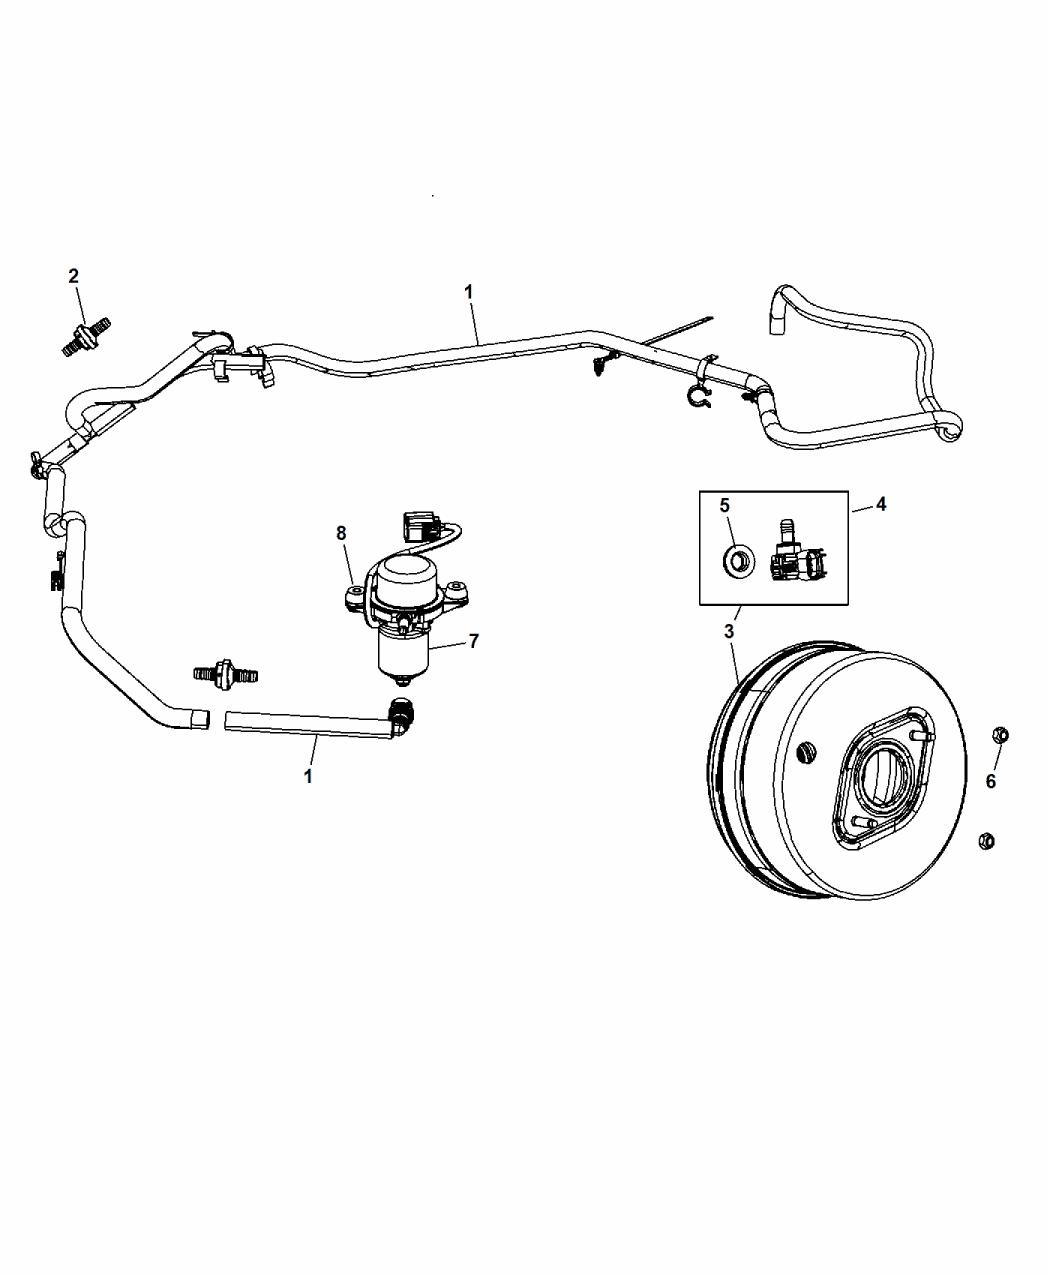 Bn Jeep Cherokee Evap Diagram Wiring Diagram